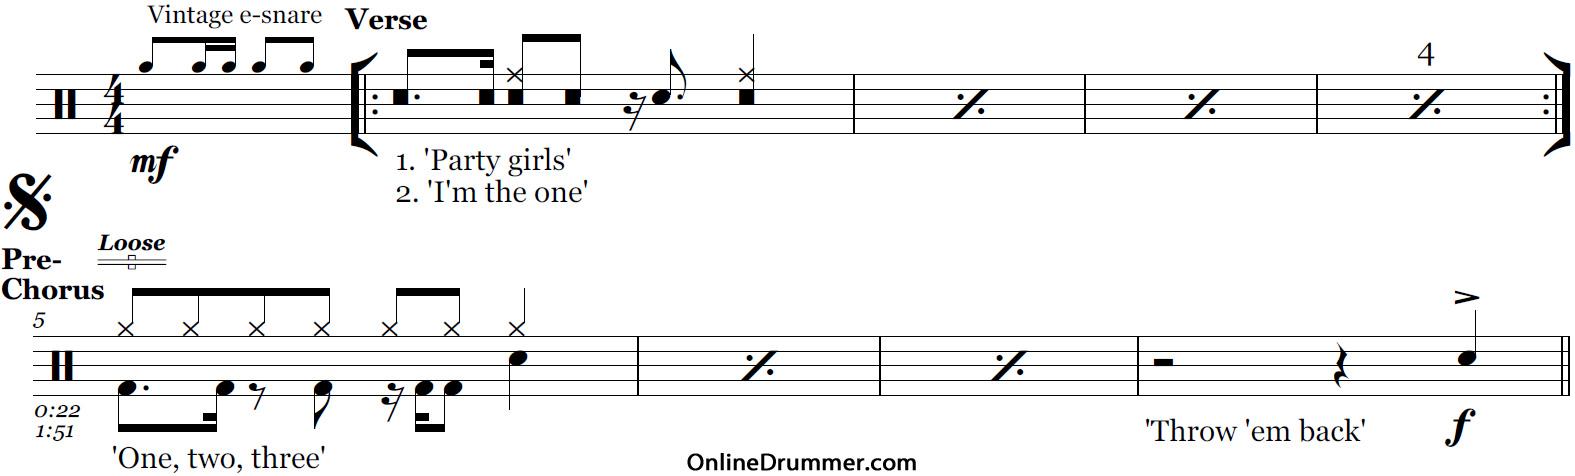 Chandelier sia drum sheet music onlinedrummer sheet music details mozeypictures Images